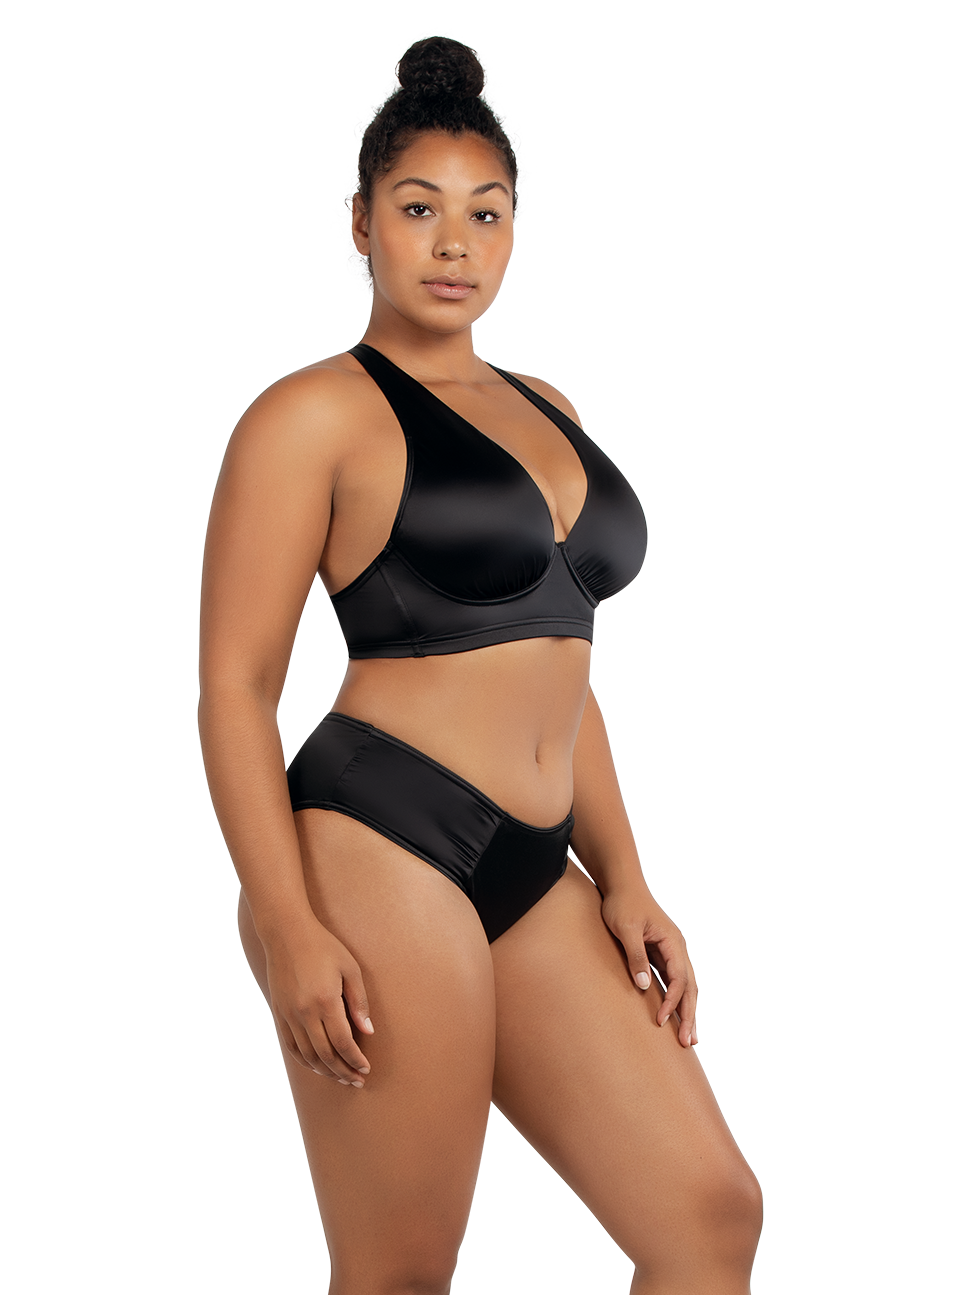 PARFAIT Rita LonglinePlungeTopS8142 BikiniBottomS8143 Black Side - Rita Bikini Bottom Black S8143